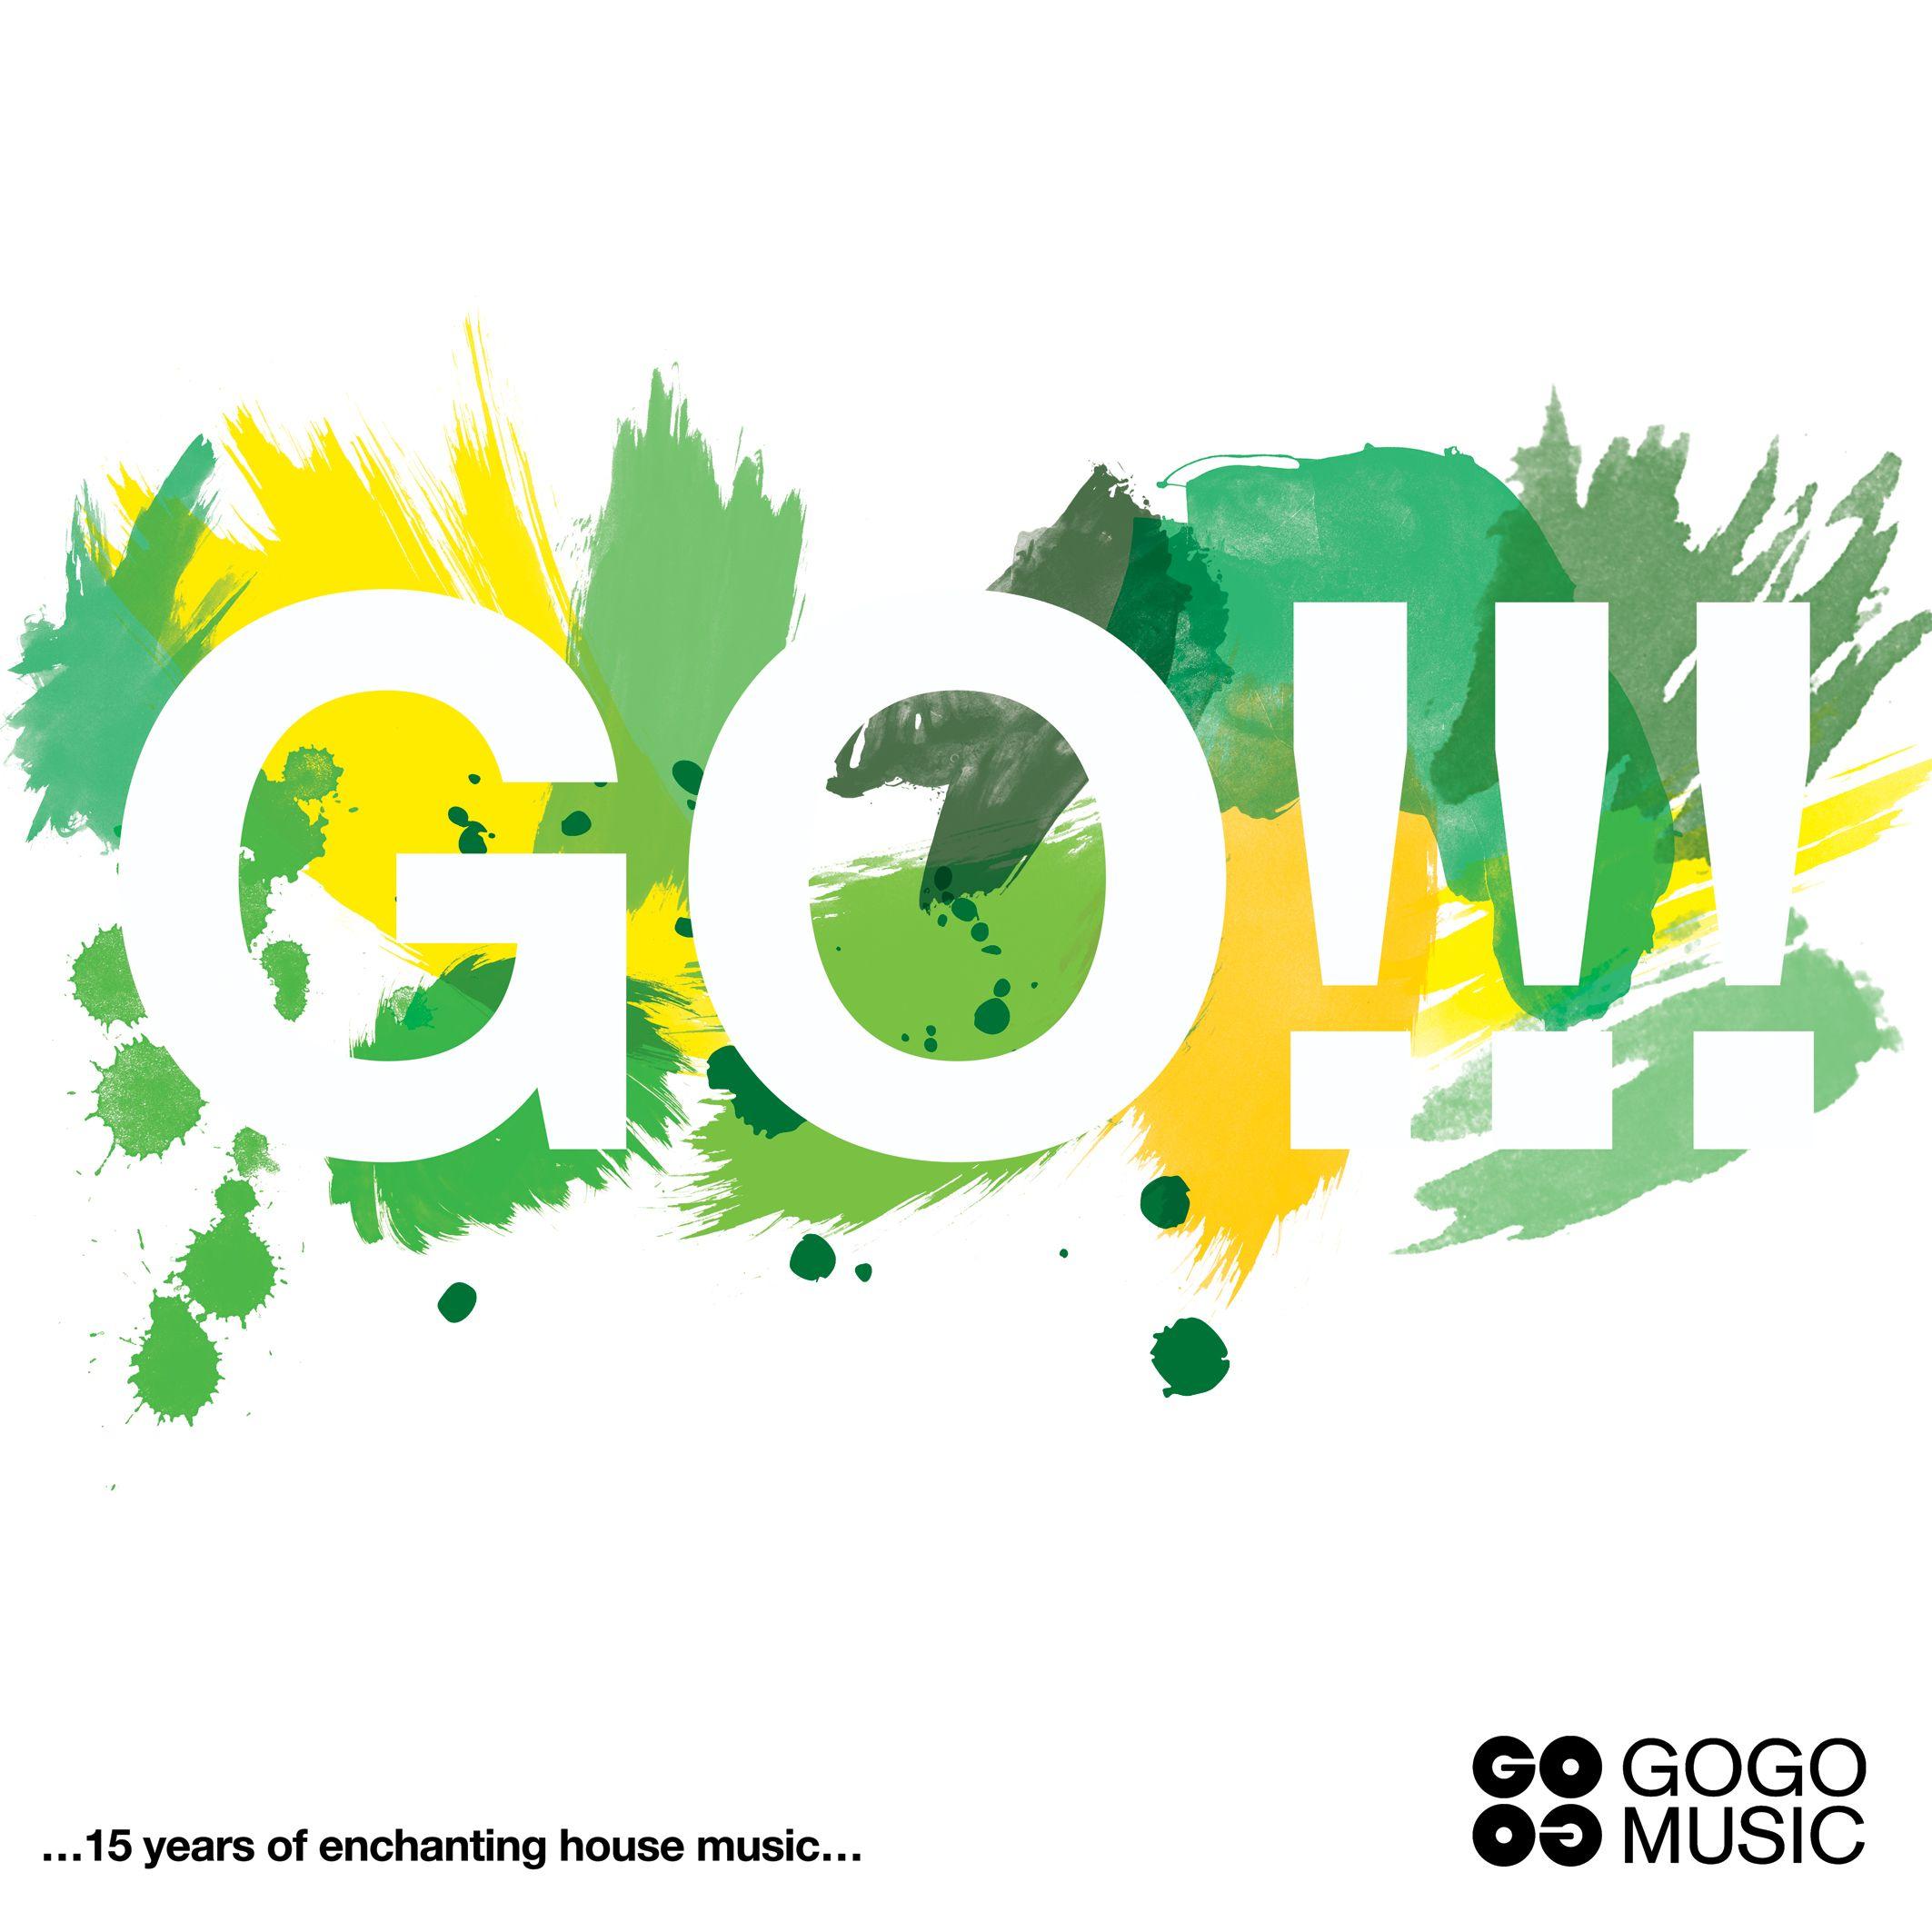 gocd009_-_b-king-001-go-3-front-cover-square.jpg